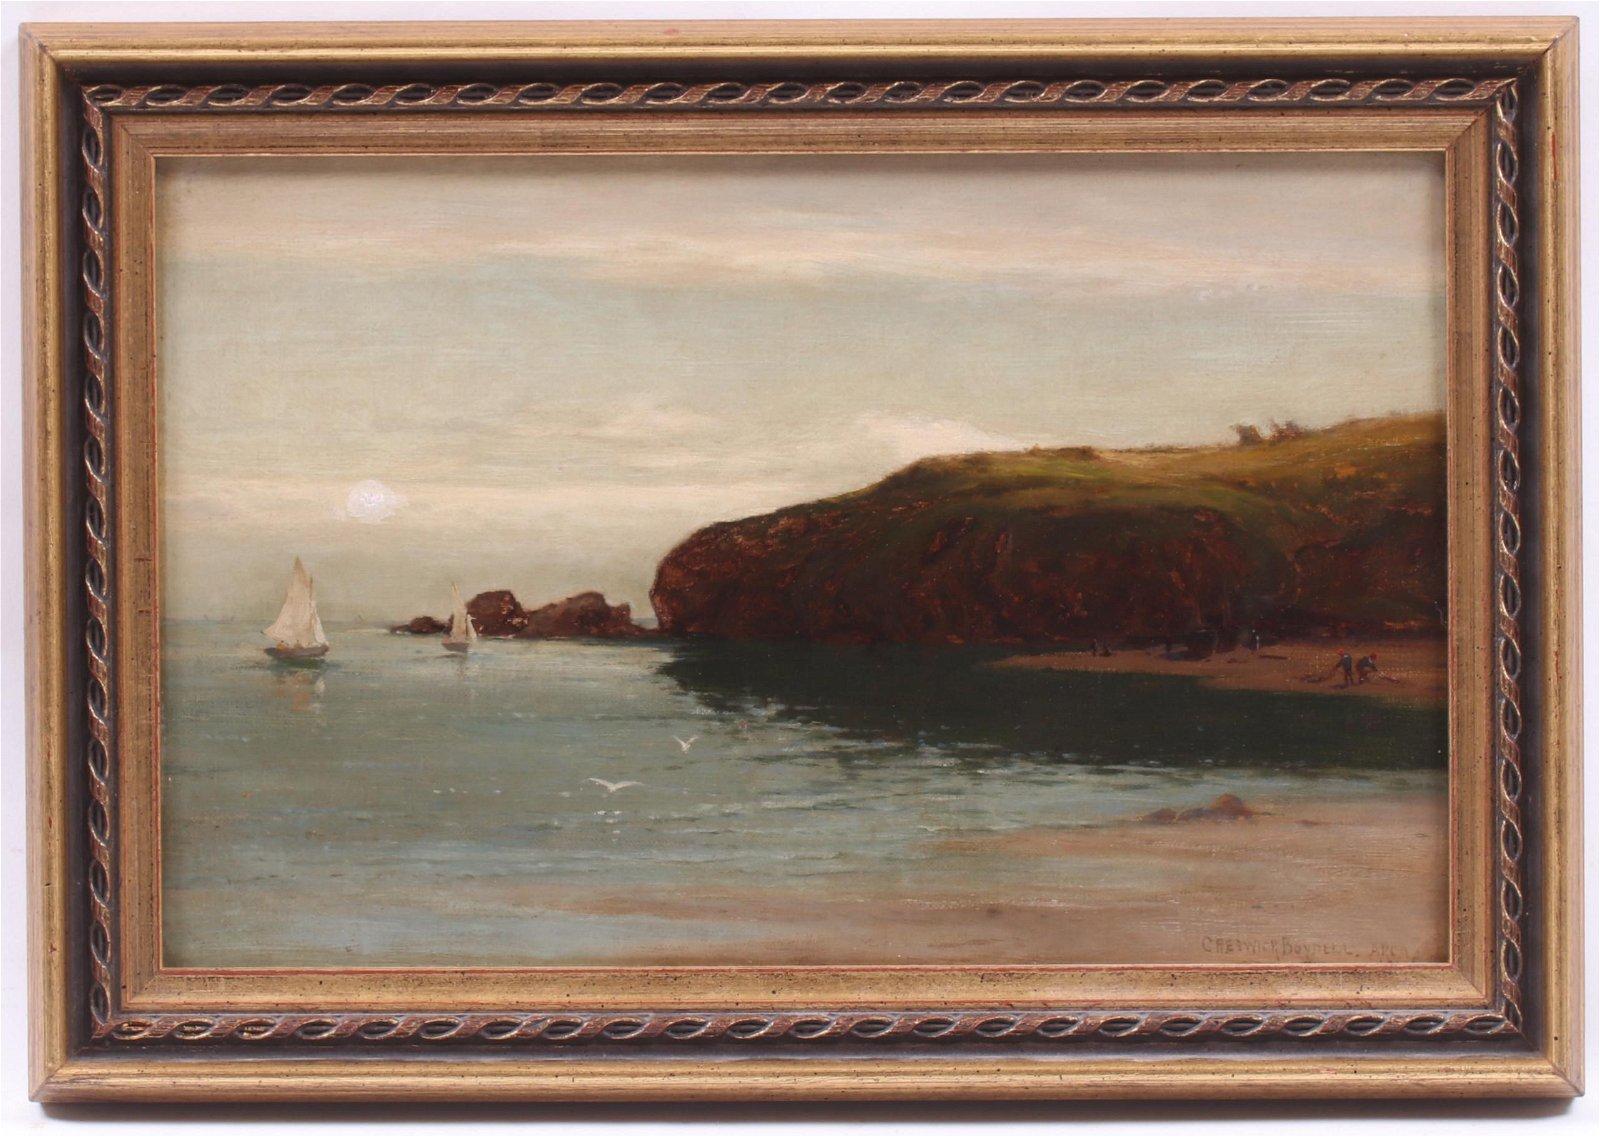 Creswick Boydell (c.1889-1916) Oil on Canvas